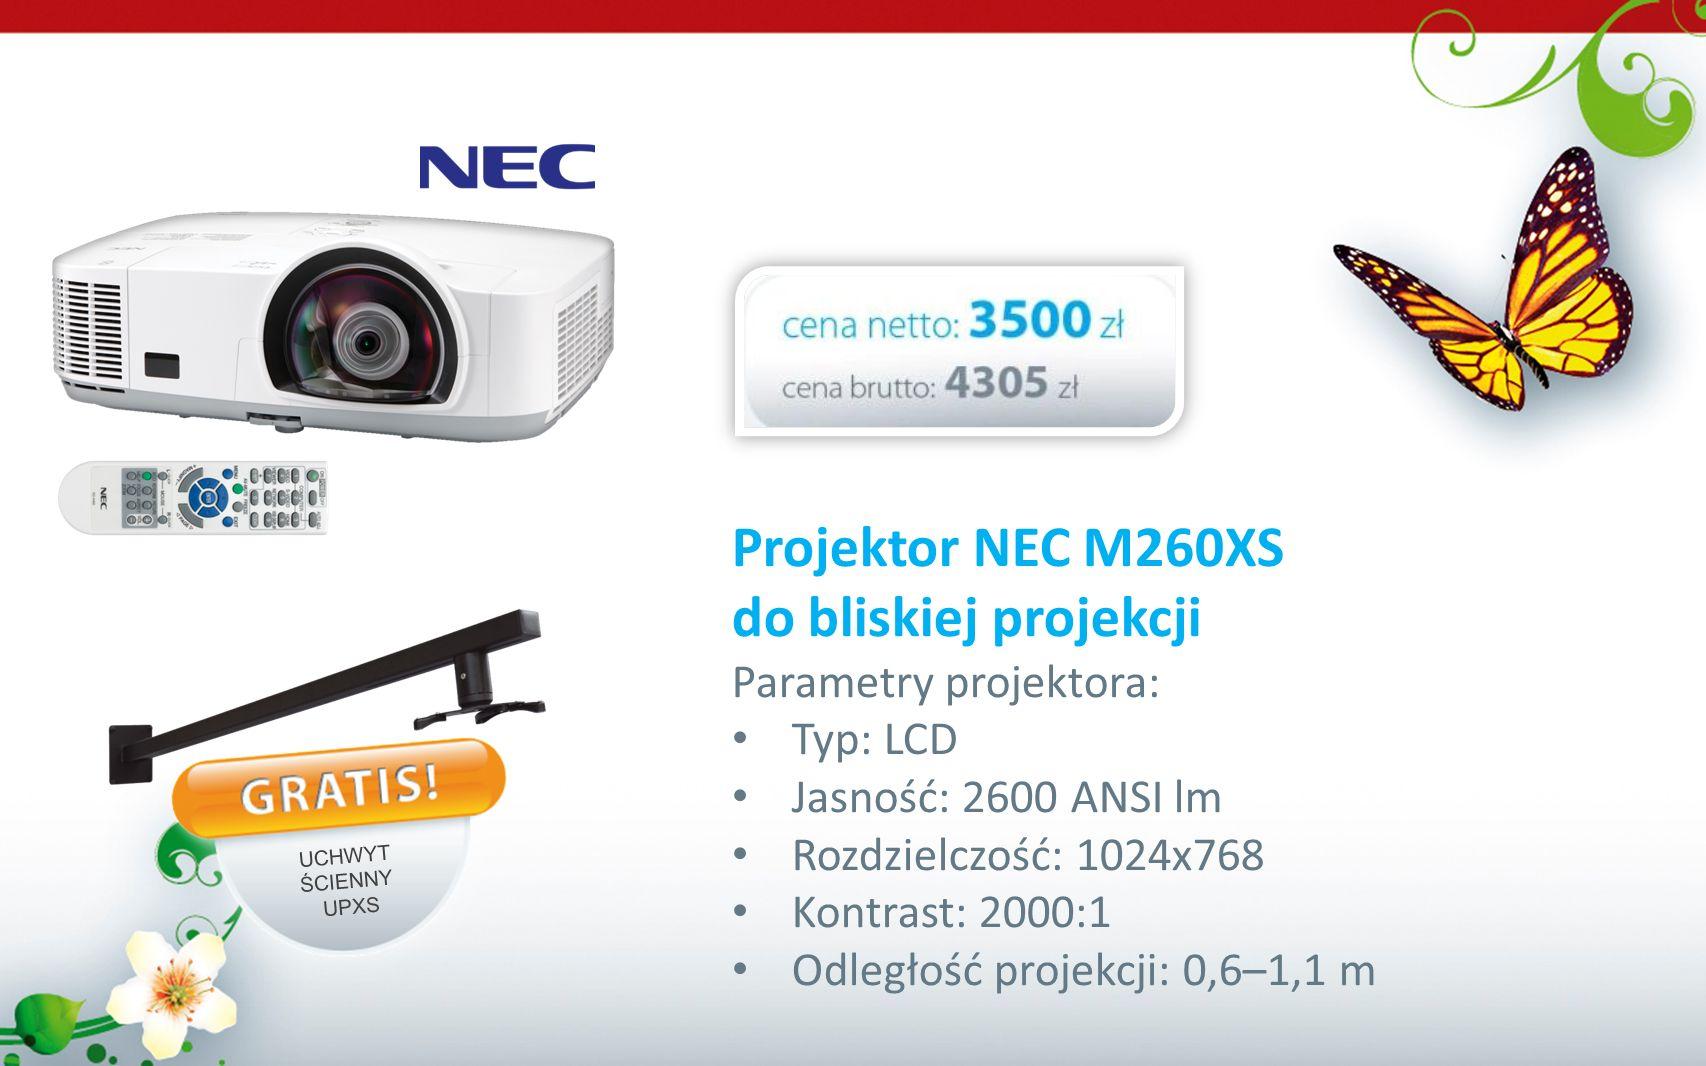 Projektor NEC M260XS do bliskiej projekcji